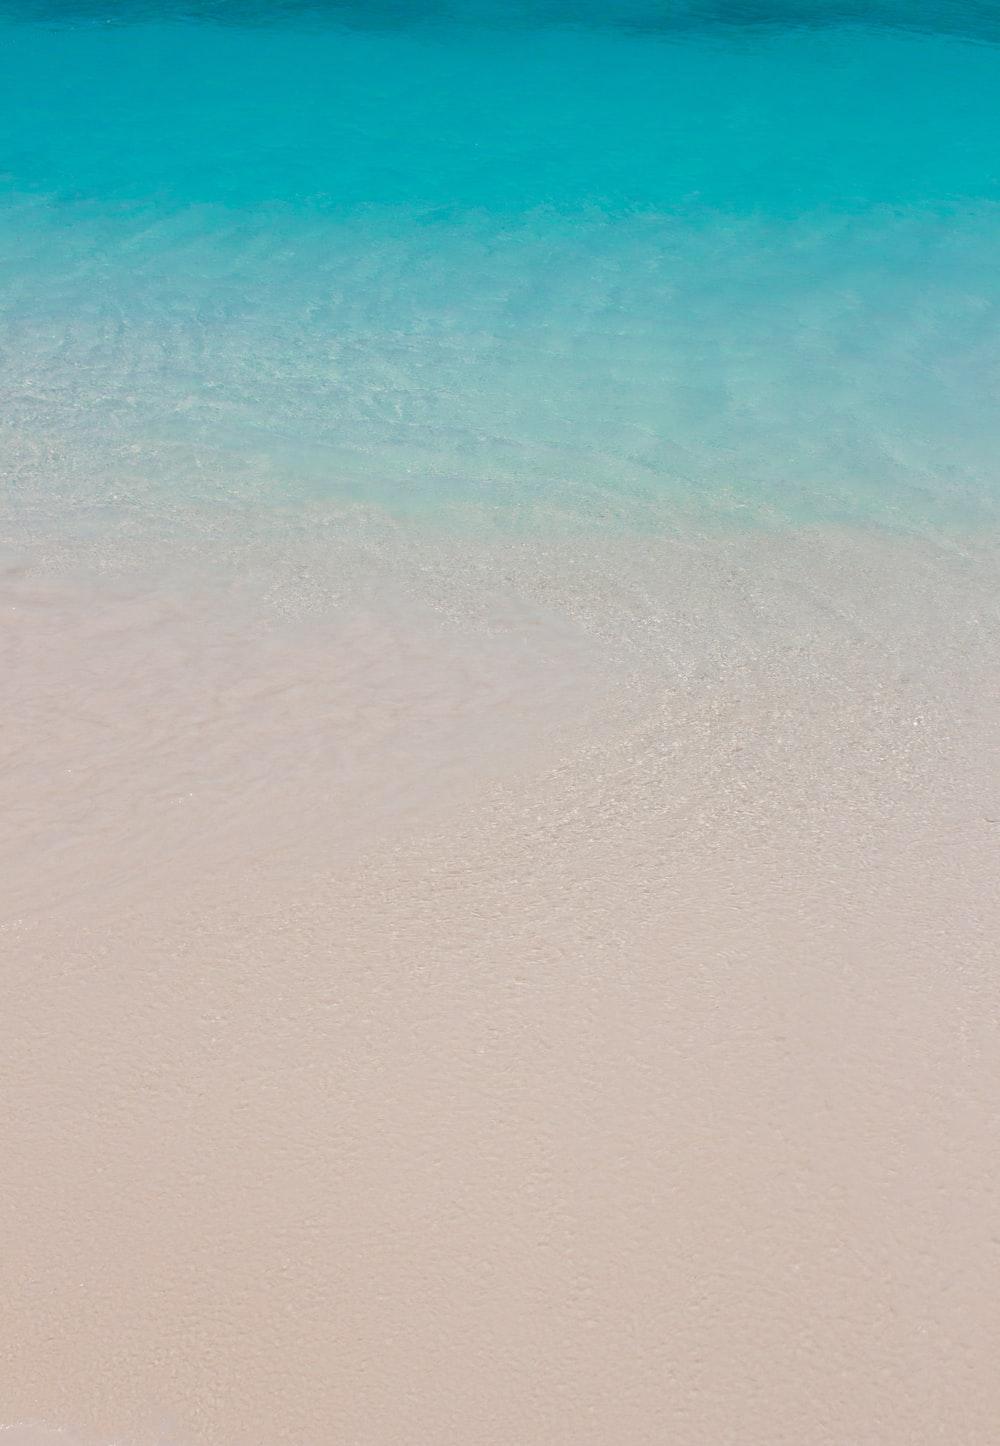 white sand beach with blue sea